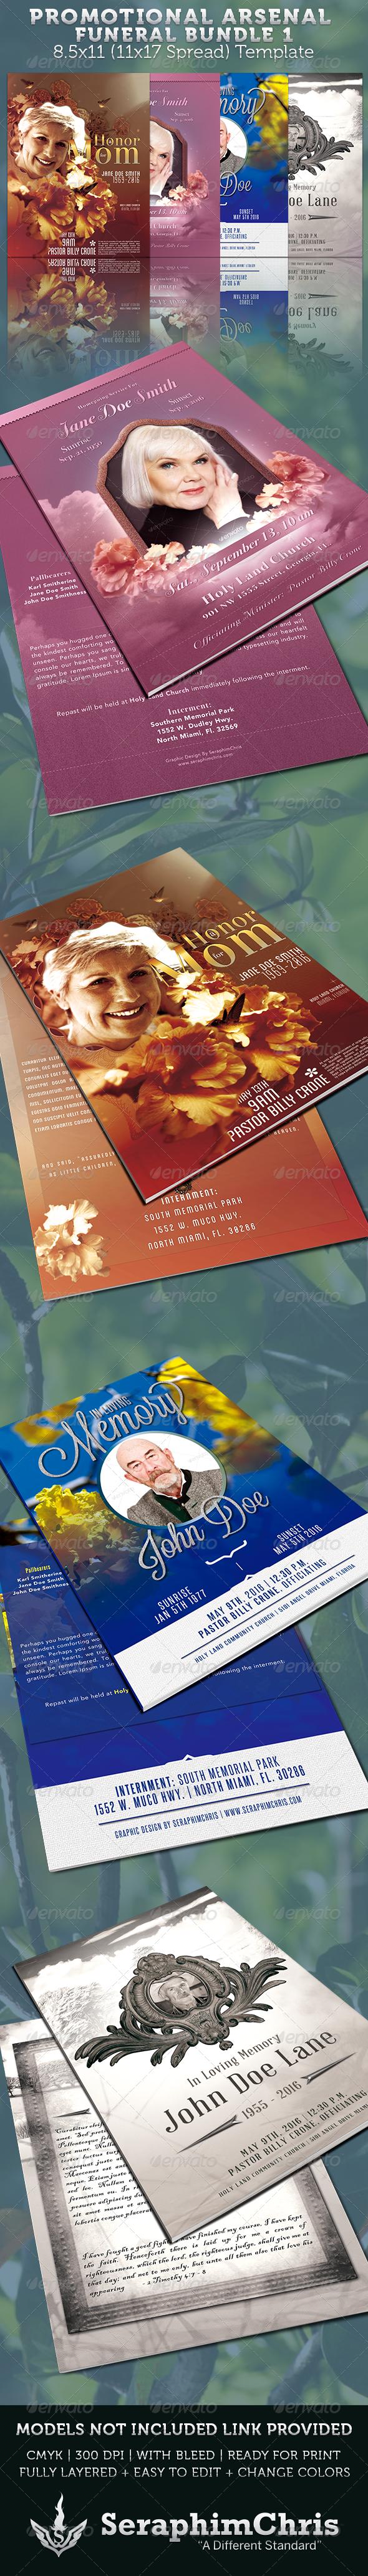 GraphicRiver Promotional Arsenal Funeral Program Bundle 1 3656457